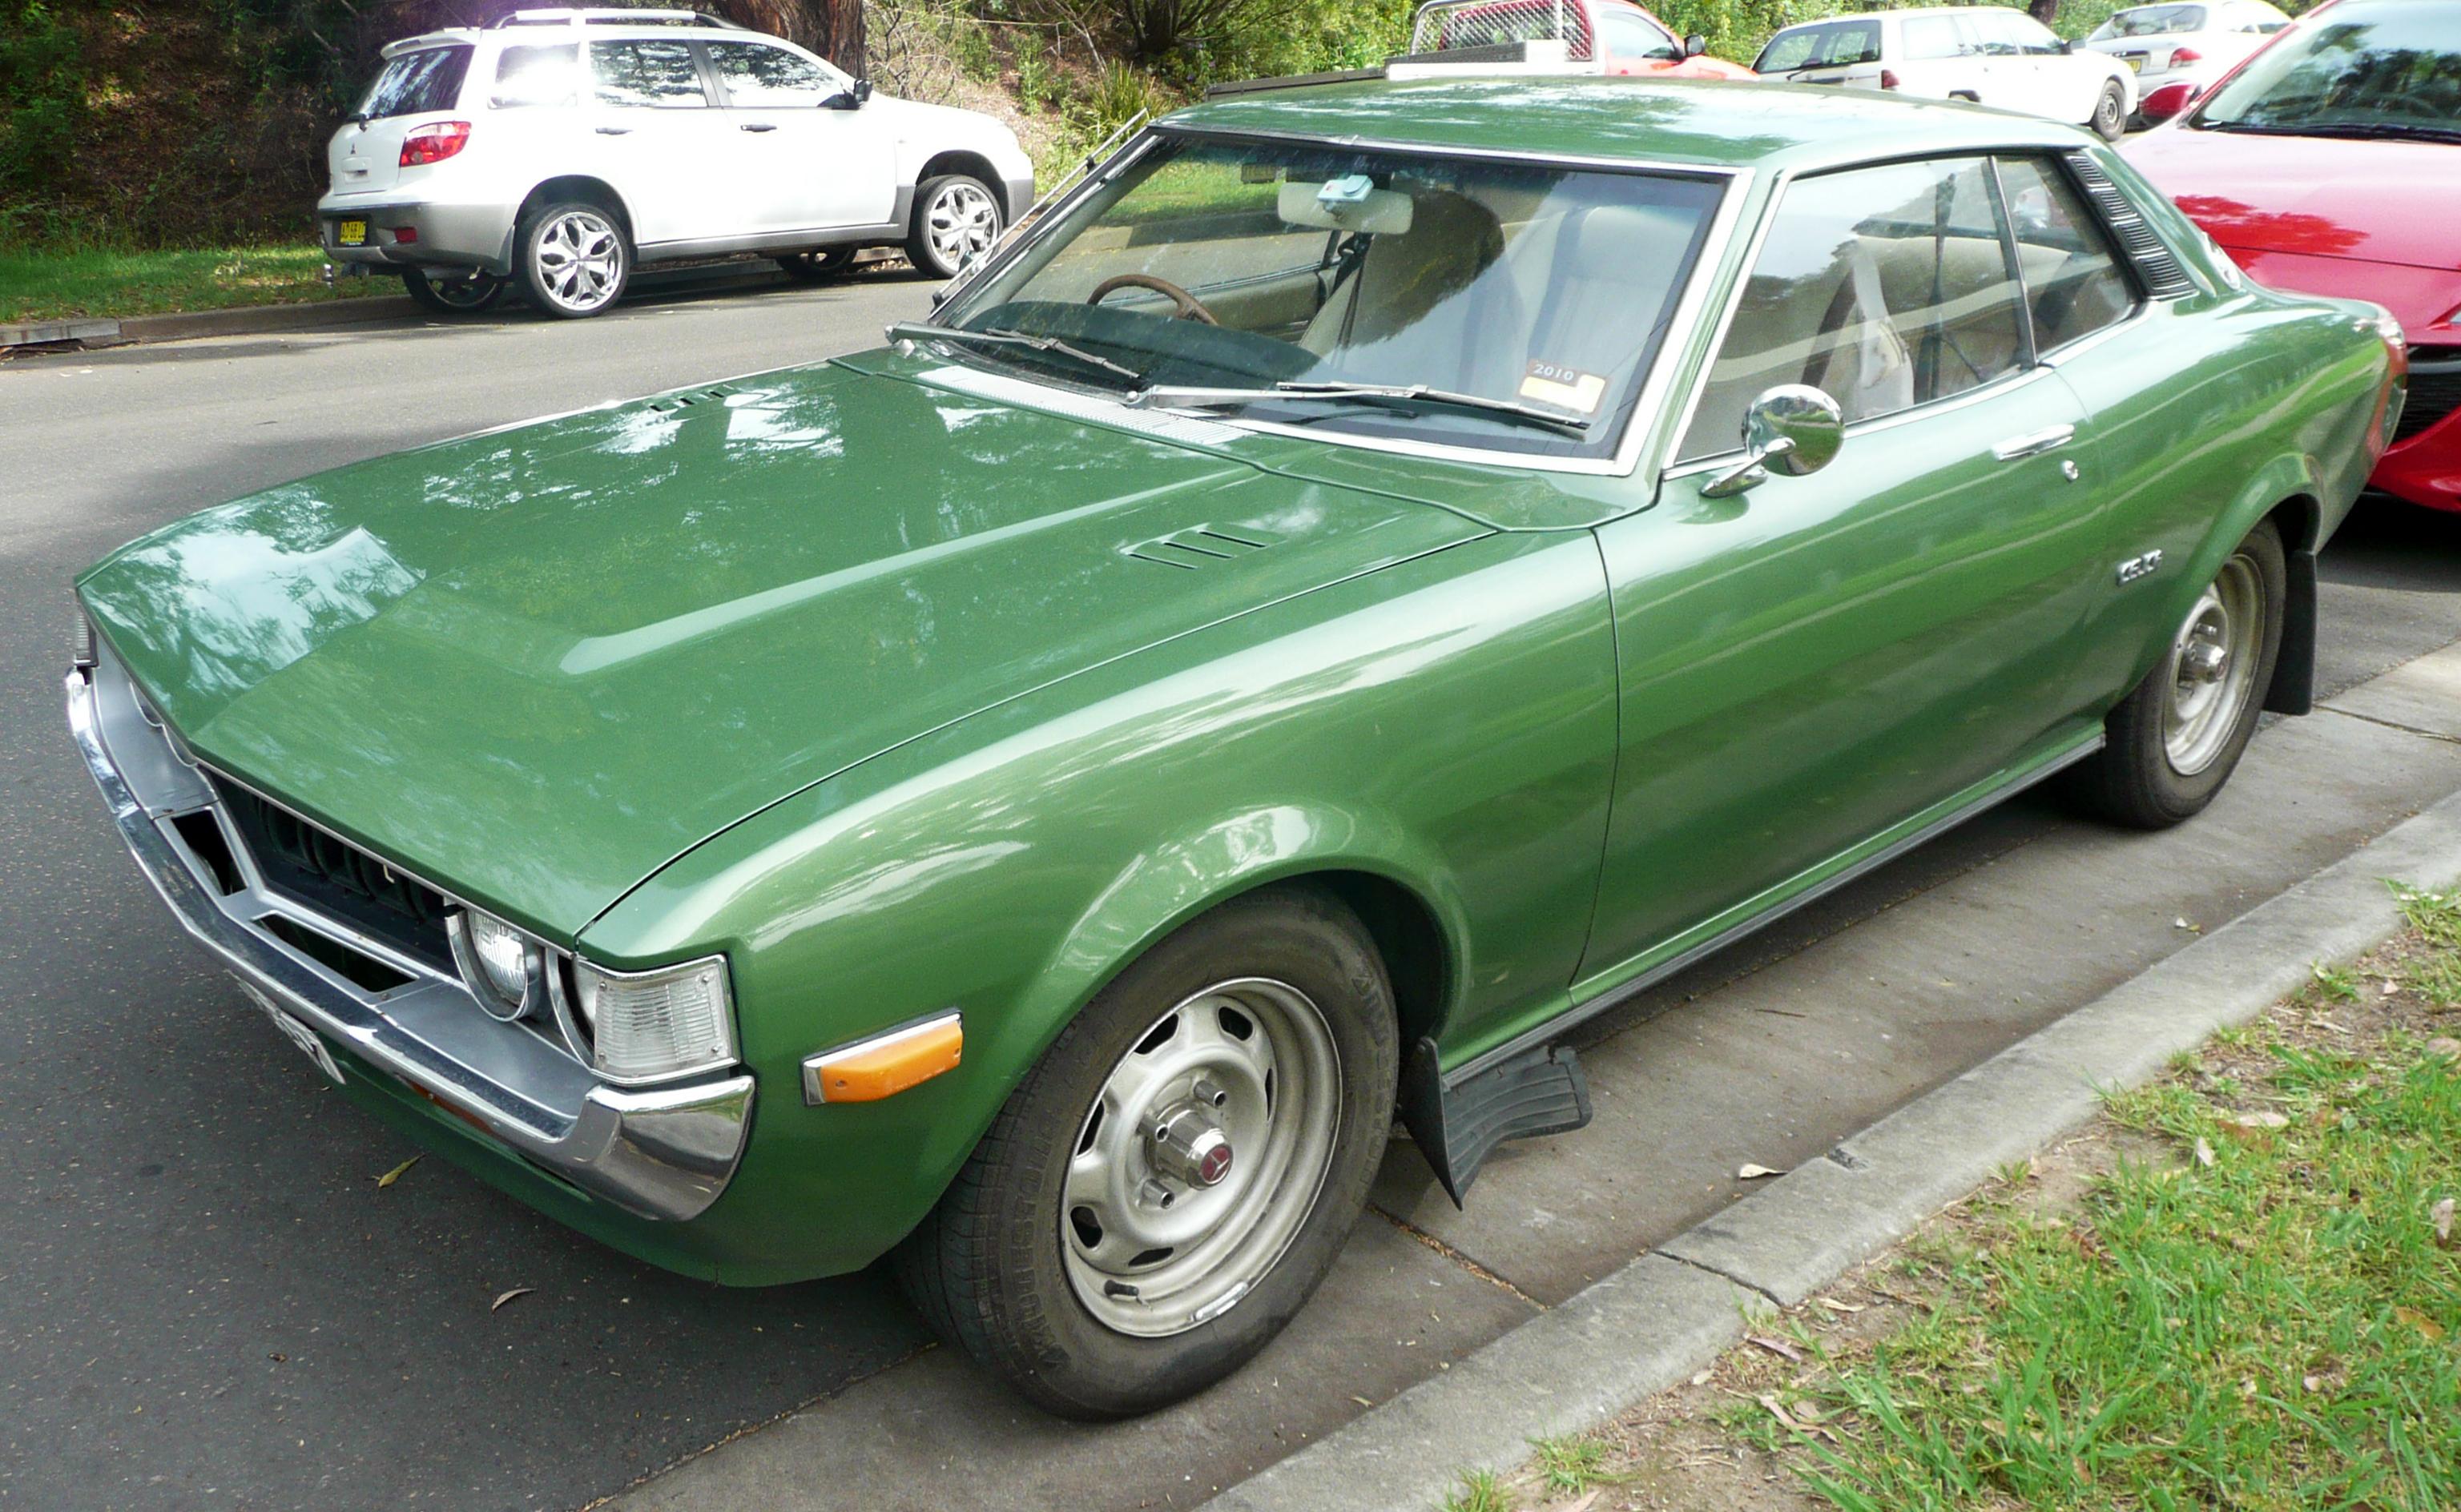 Toyota Celica Lt 1977 >> Tiedosto:1976-1977 Toyota Celica (RA23) LT hardtop 01.jpg – Wikipedia